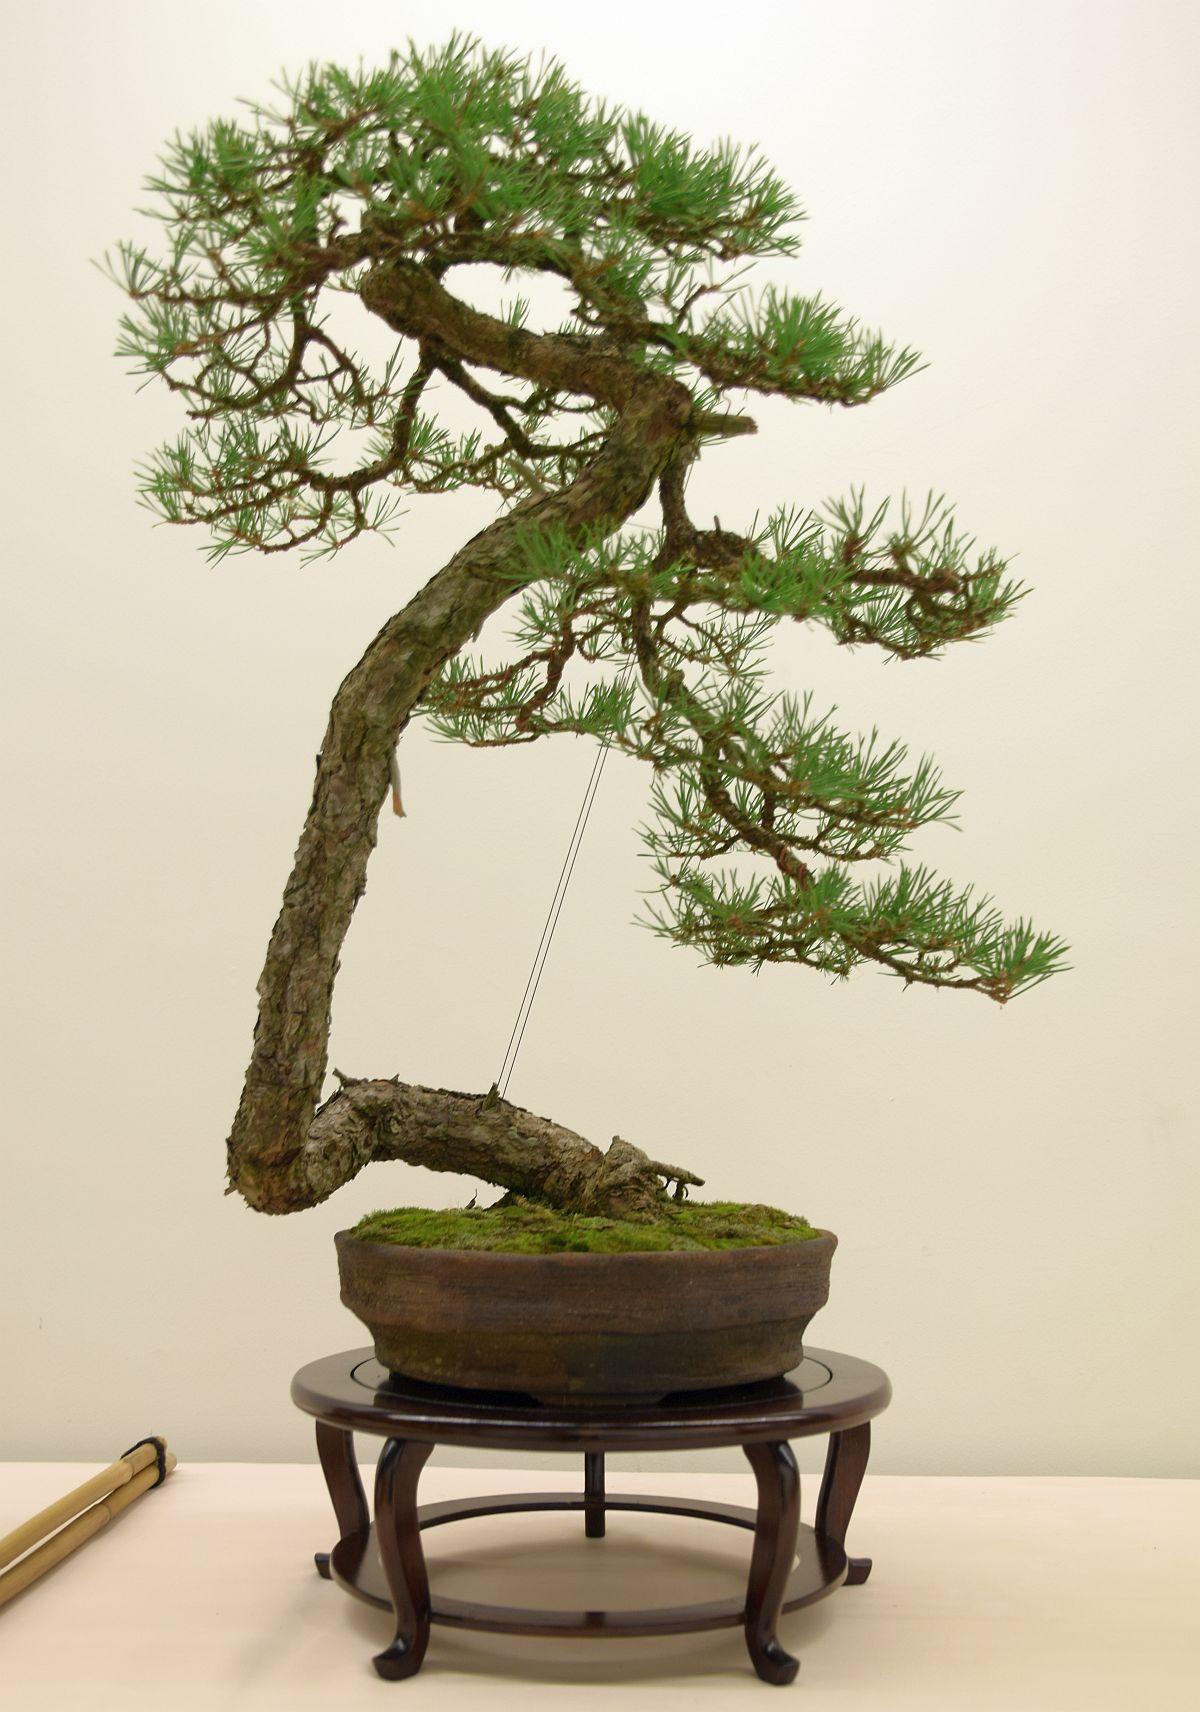 euk-bonsai-ten-2016-club-bonsai-005